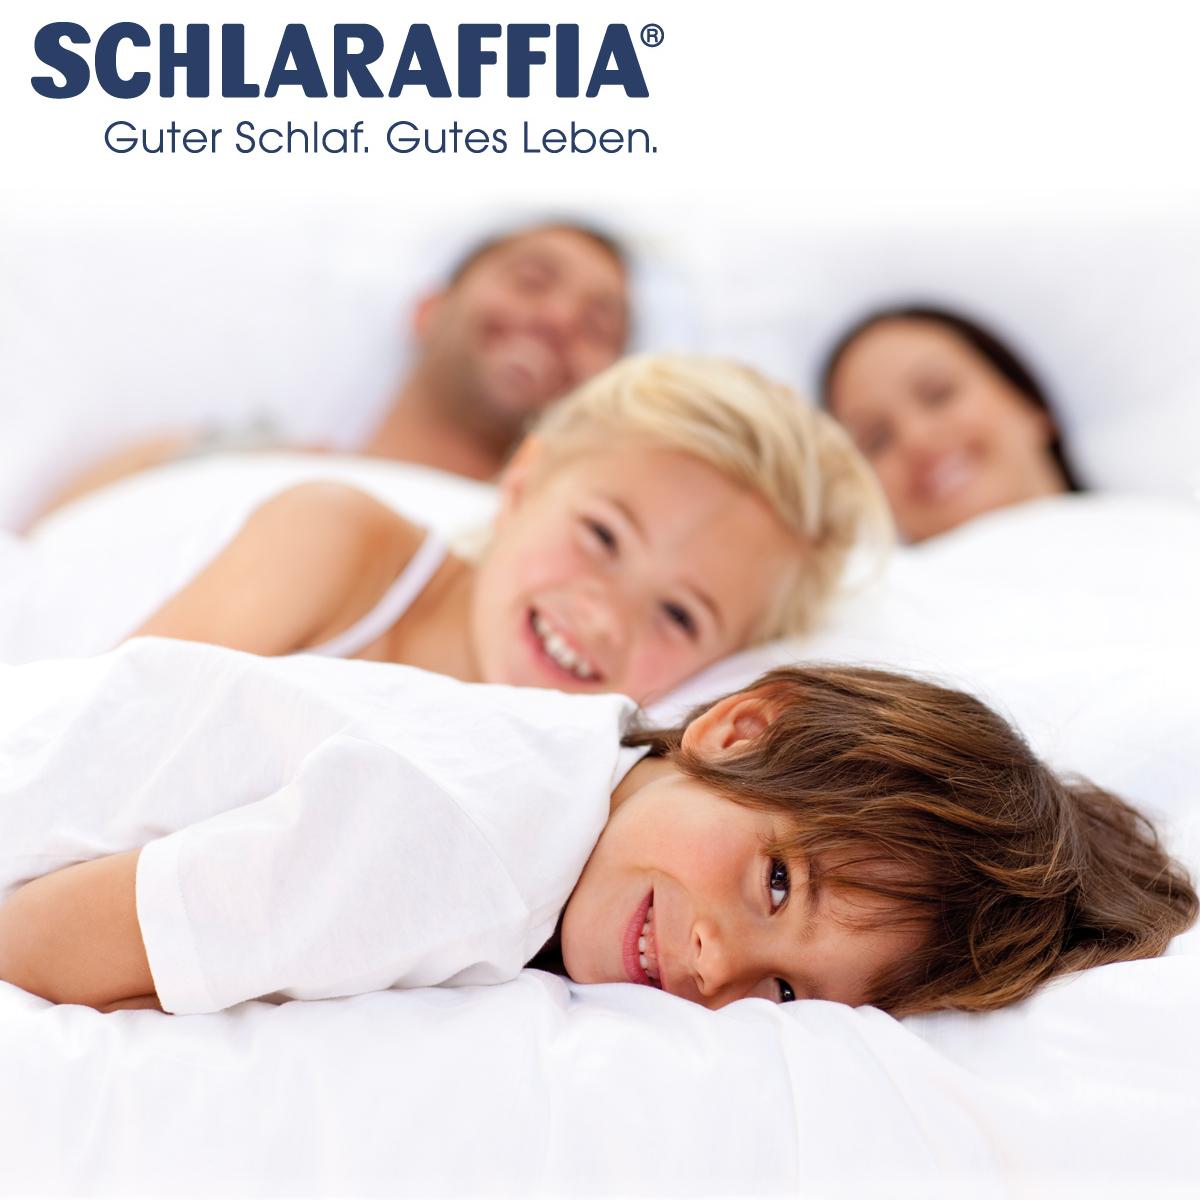 schlaraffia sky 200 bultex matratze 180x220 cm h3 matratzen nach gr e sondergr en 180 x 220 cm. Black Bedroom Furniture Sets. Home Design Ideas